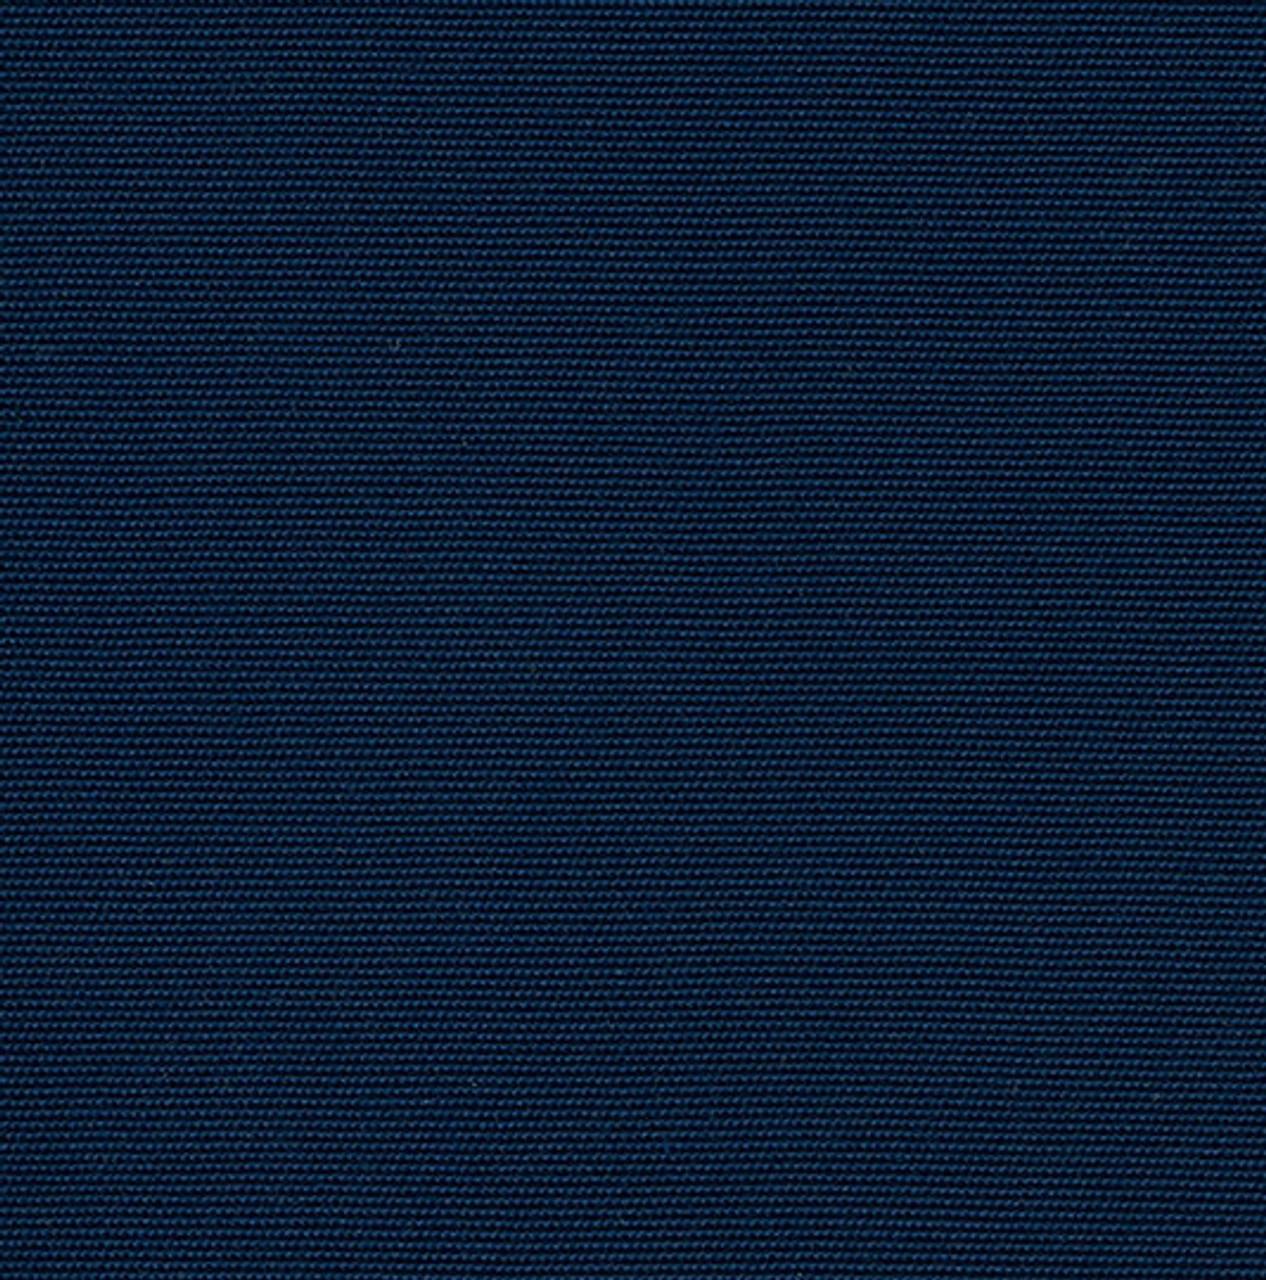 Recacril R-170 Admiral Blue